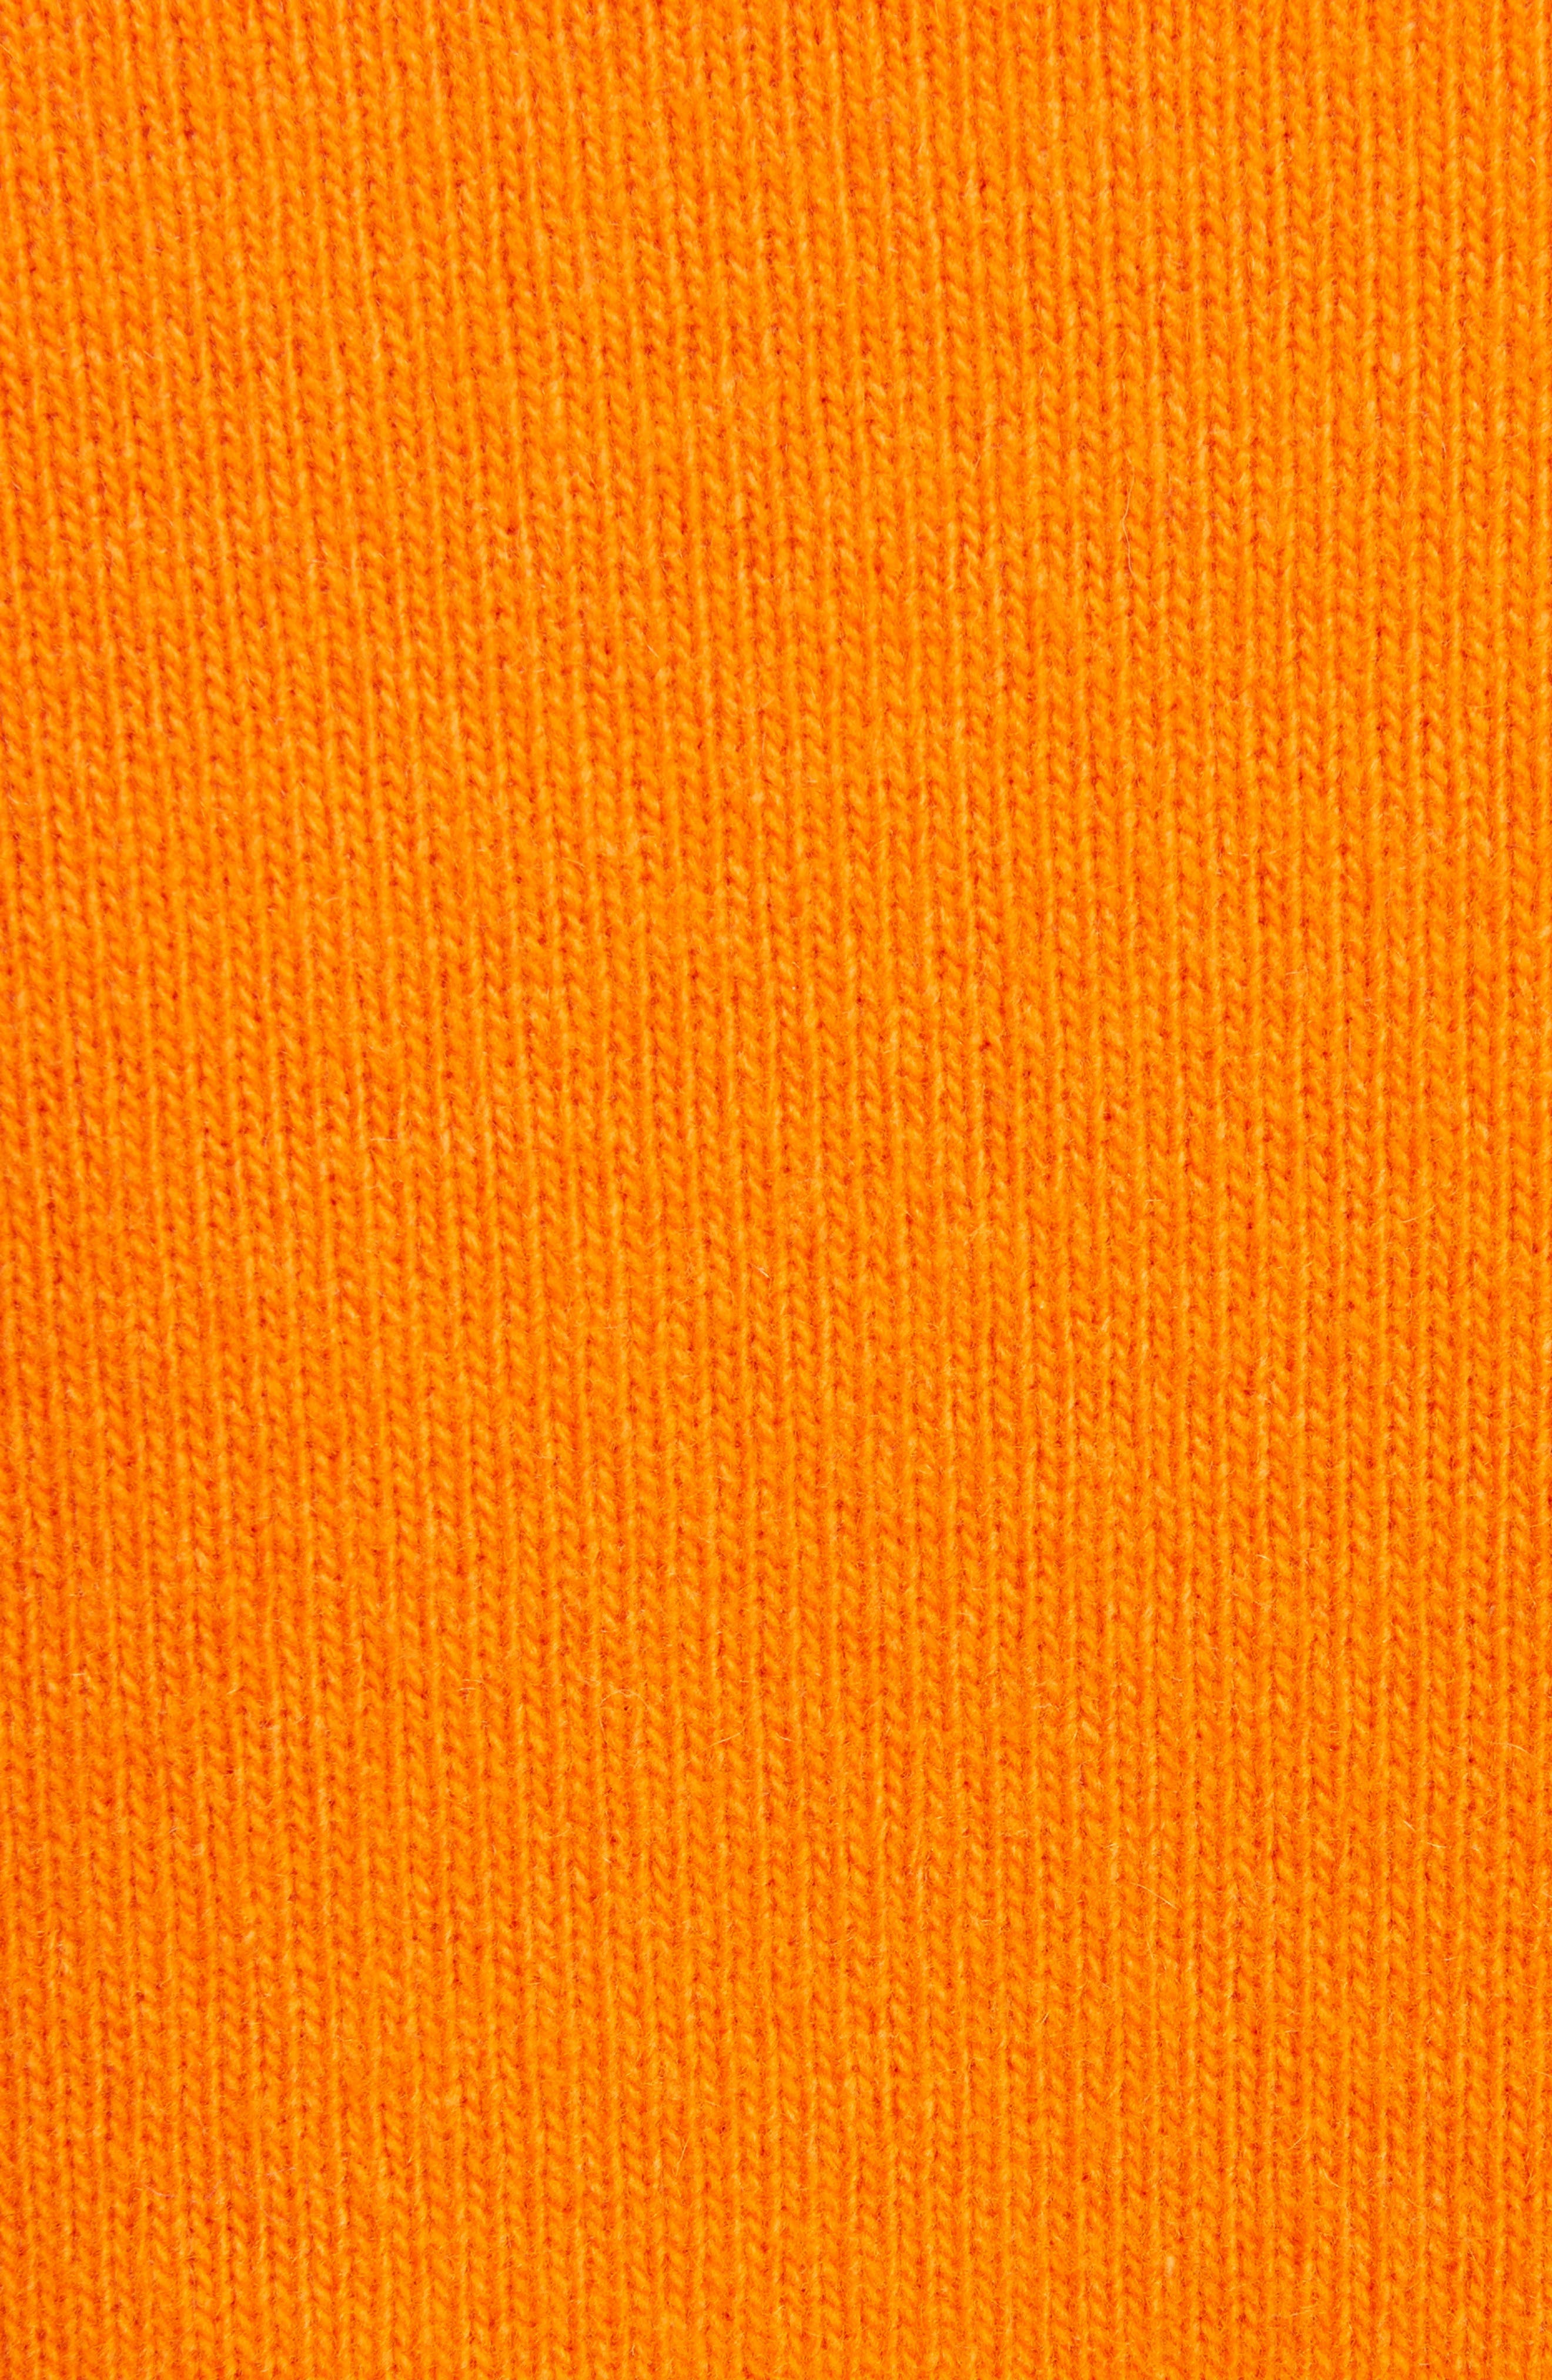 J.W.ANDERSON Multi Pocket Crewneck Sweater,                             Alternate thumbnail 3, color,                             Tangerine